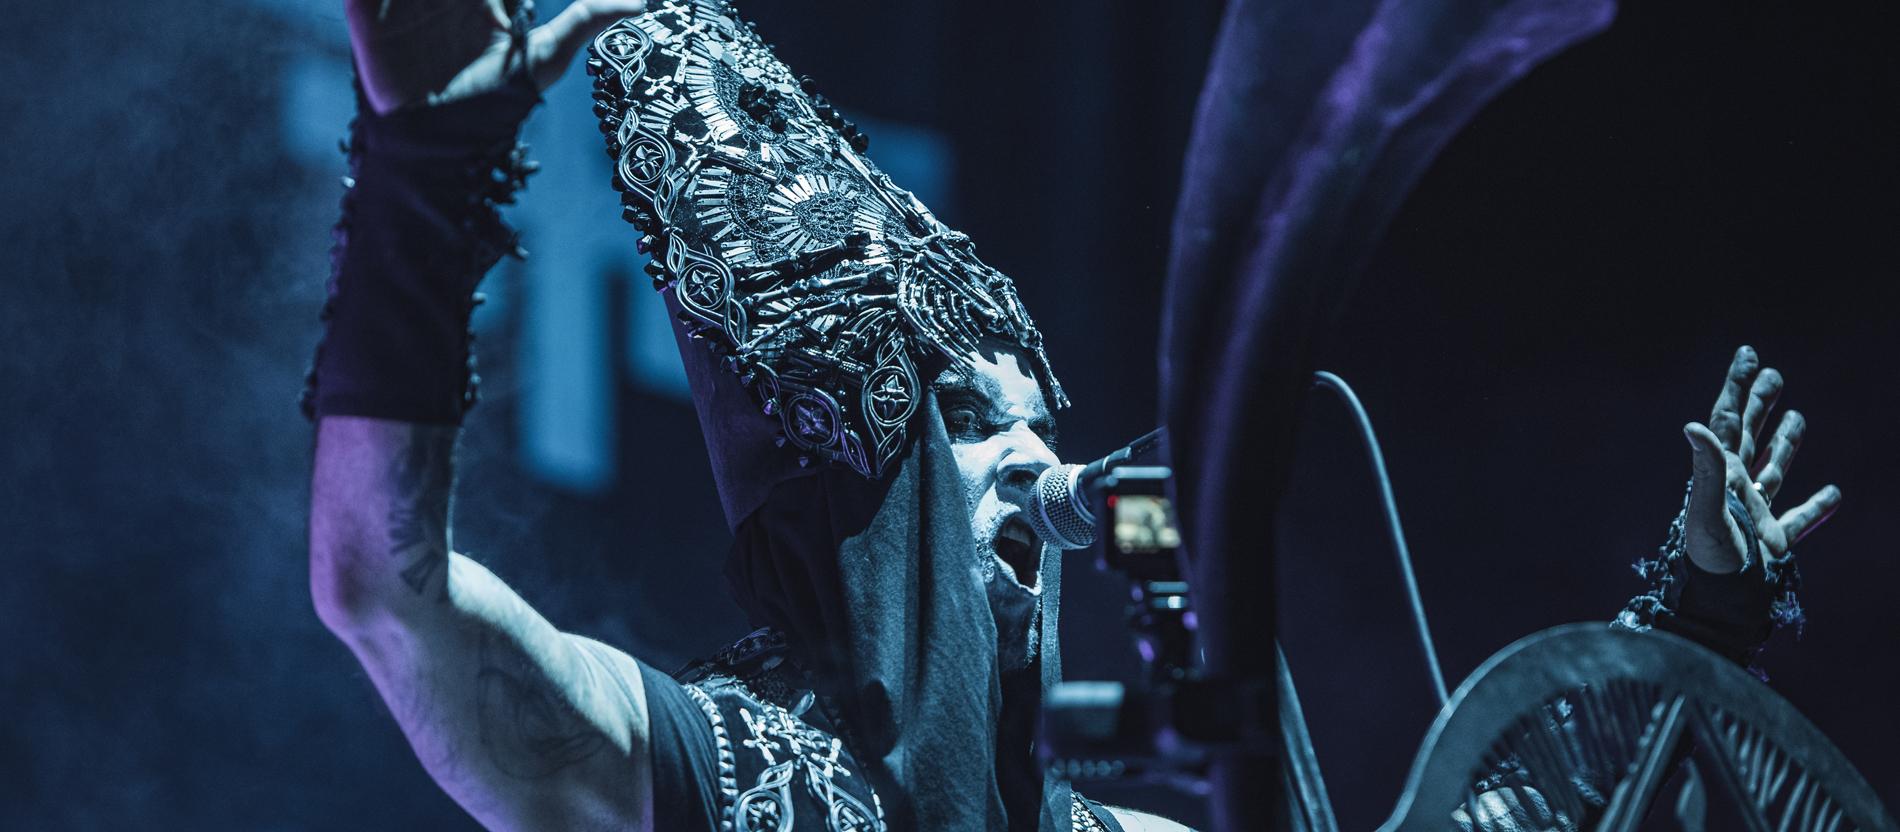 Polnischer Metal-Musiker wegen religiöser Beleidigung verurteilt - katholisch.de